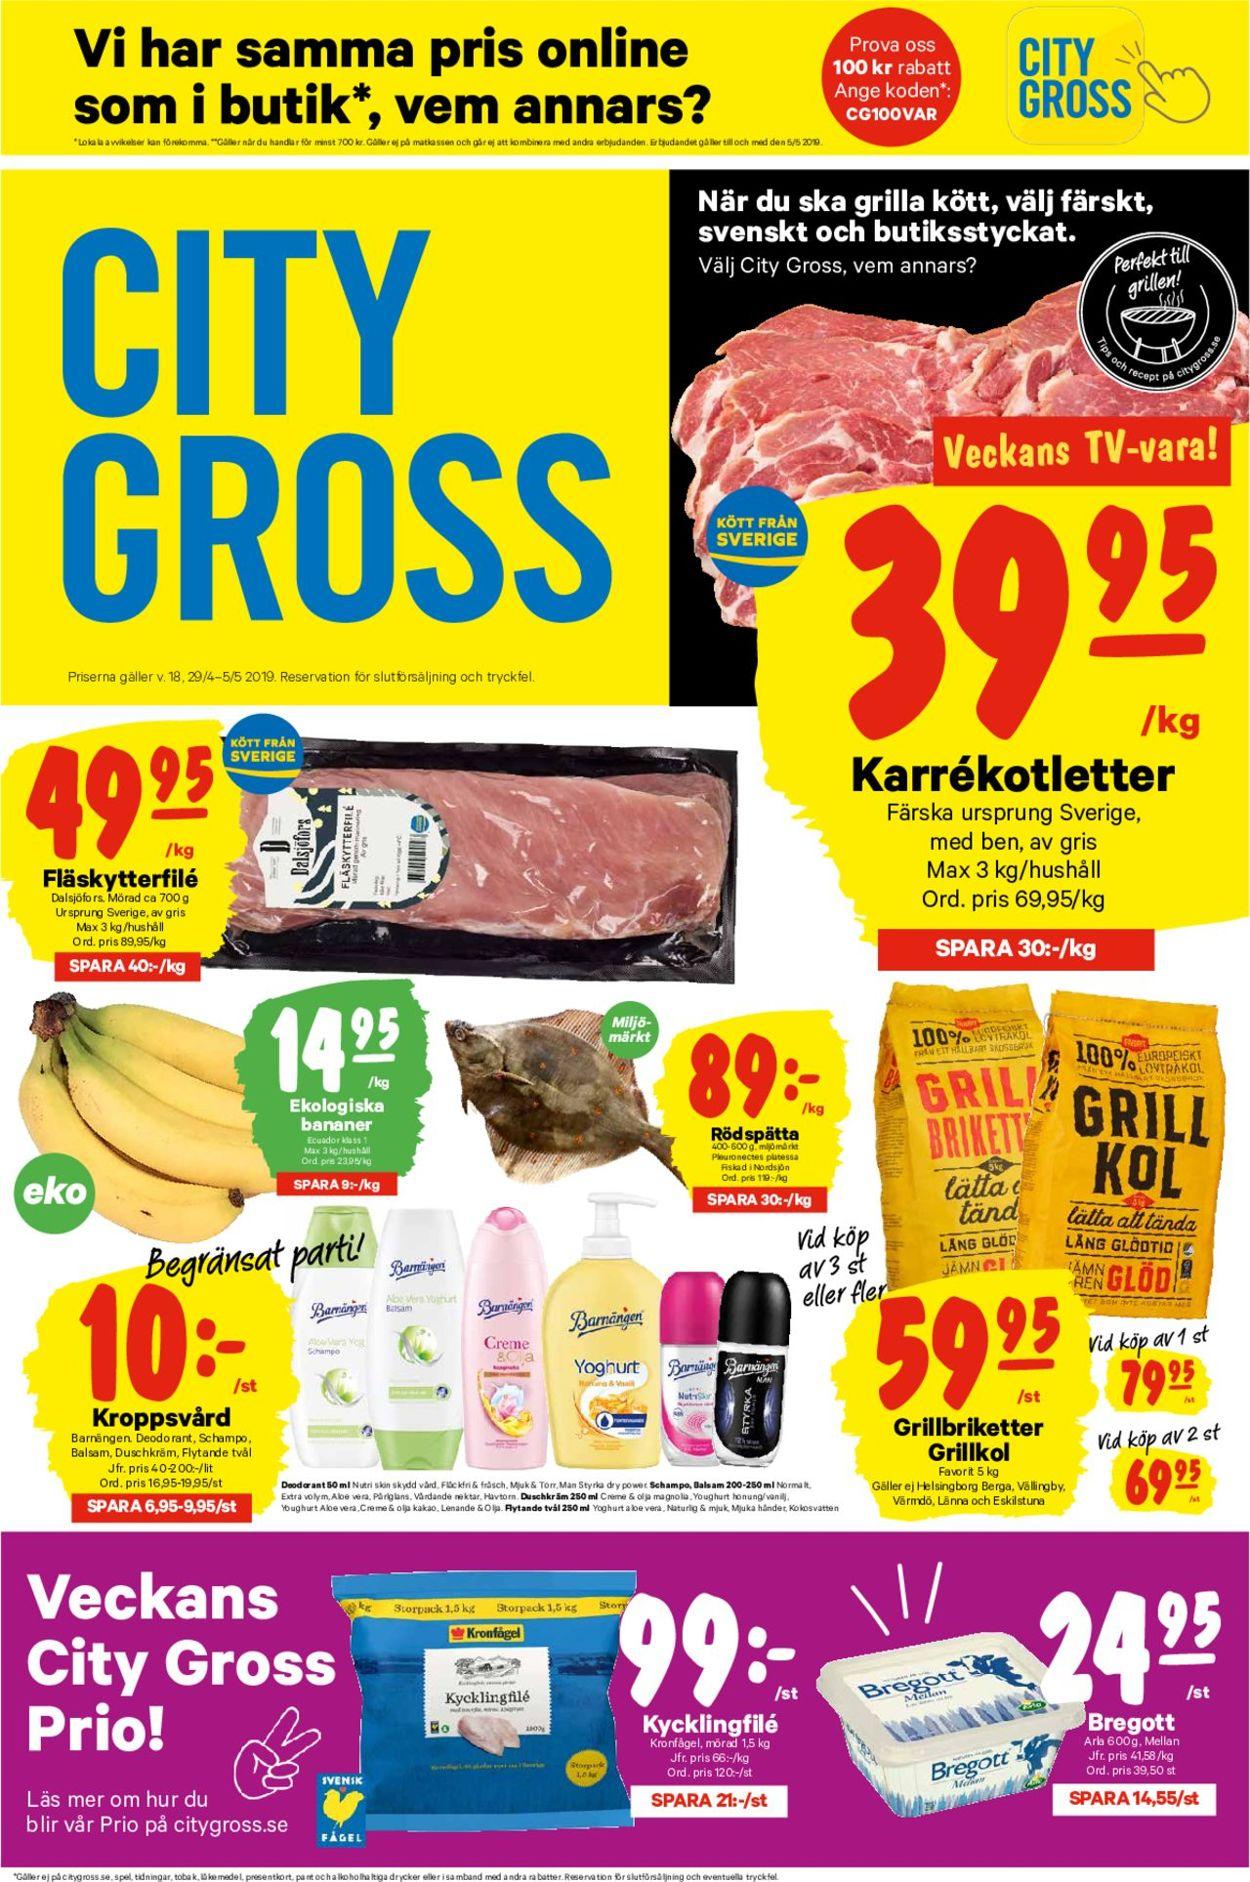 City Gross - Reklamblad - 29/04-05/05-2019